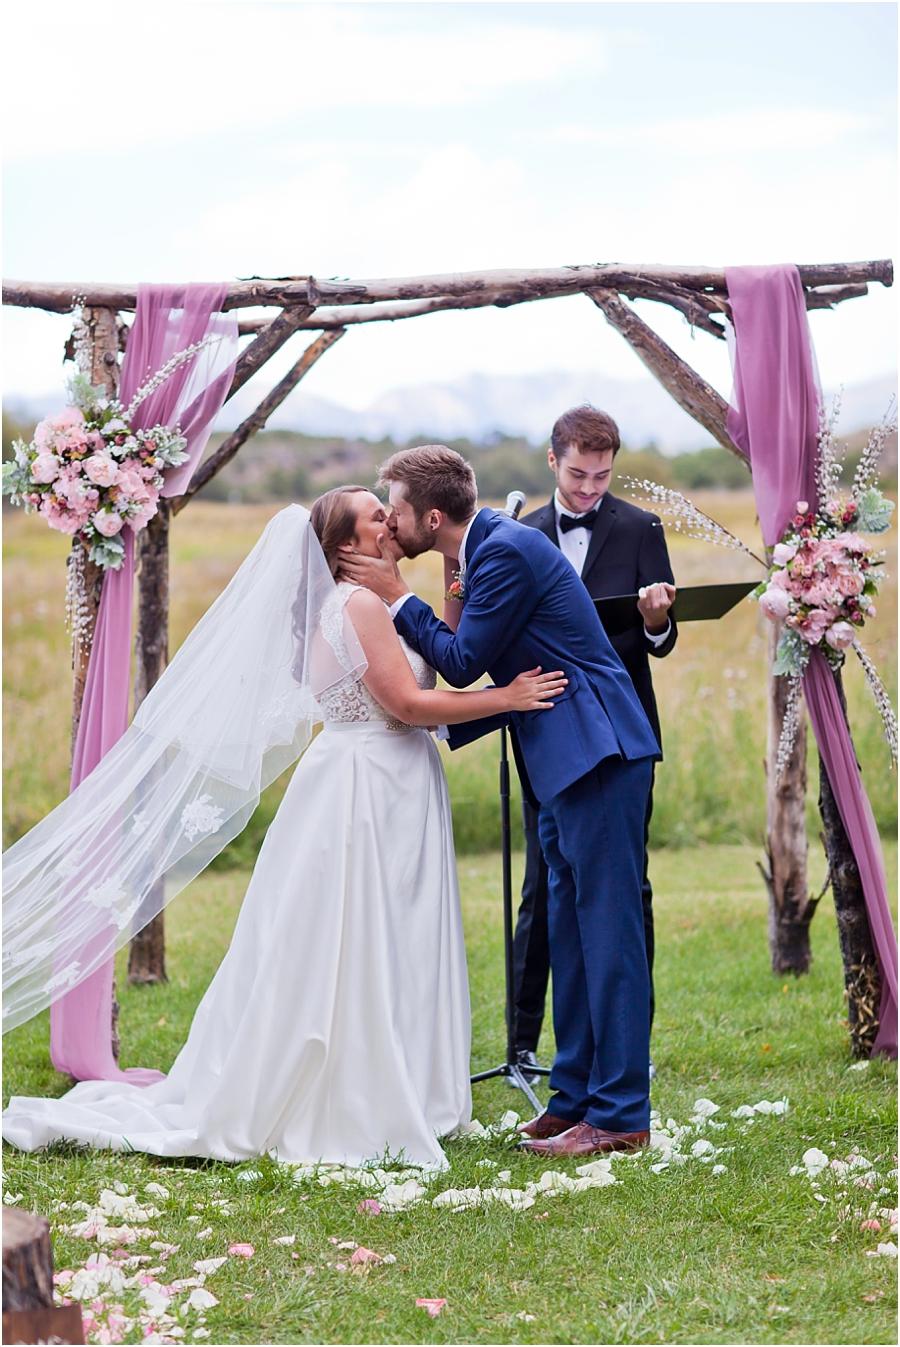 durango-affordable-wedding-photography-4.jpg